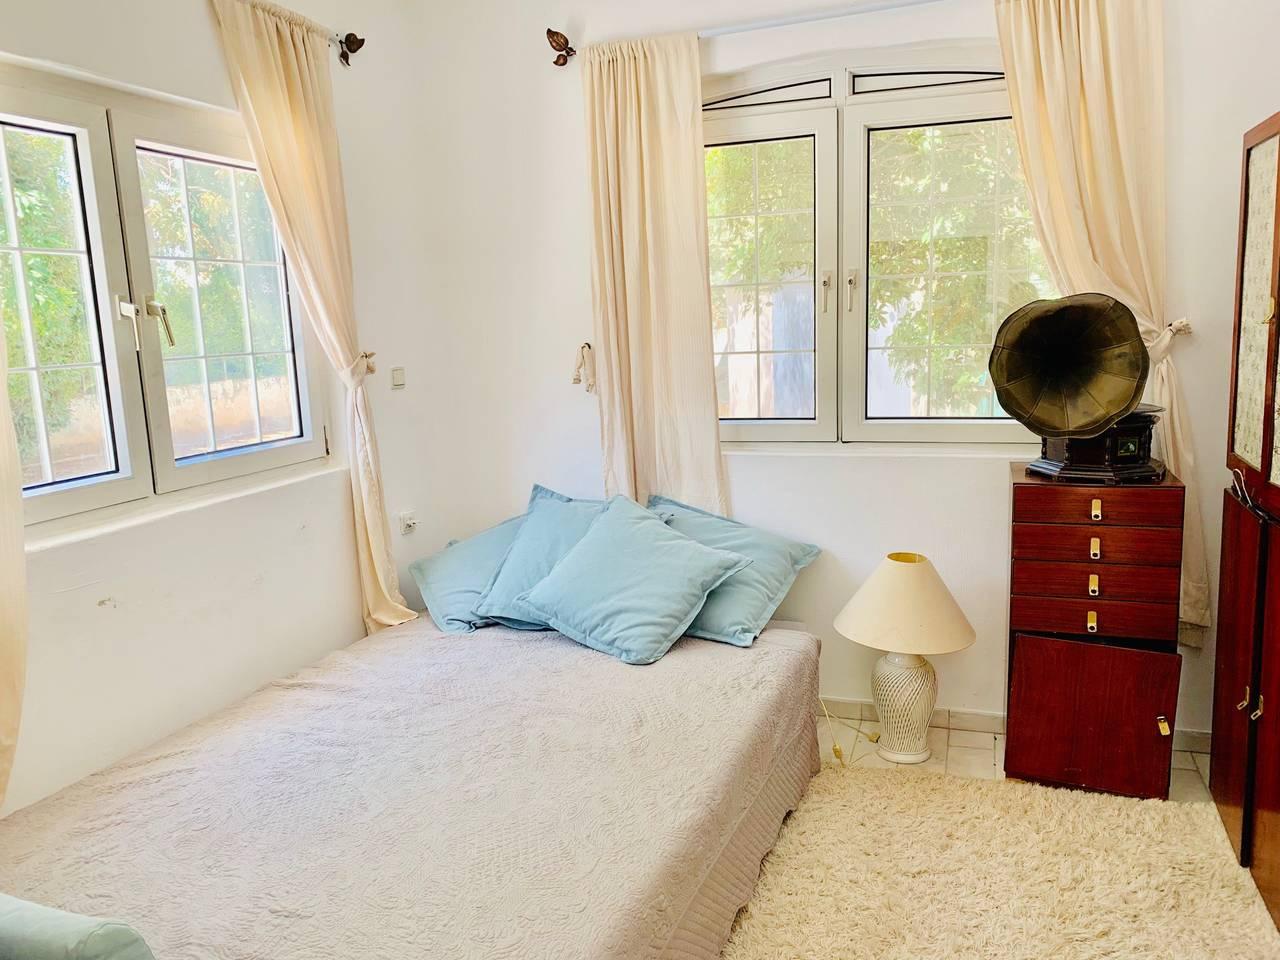 Apartment Dream house by the sea in Caesarea photo 25970051